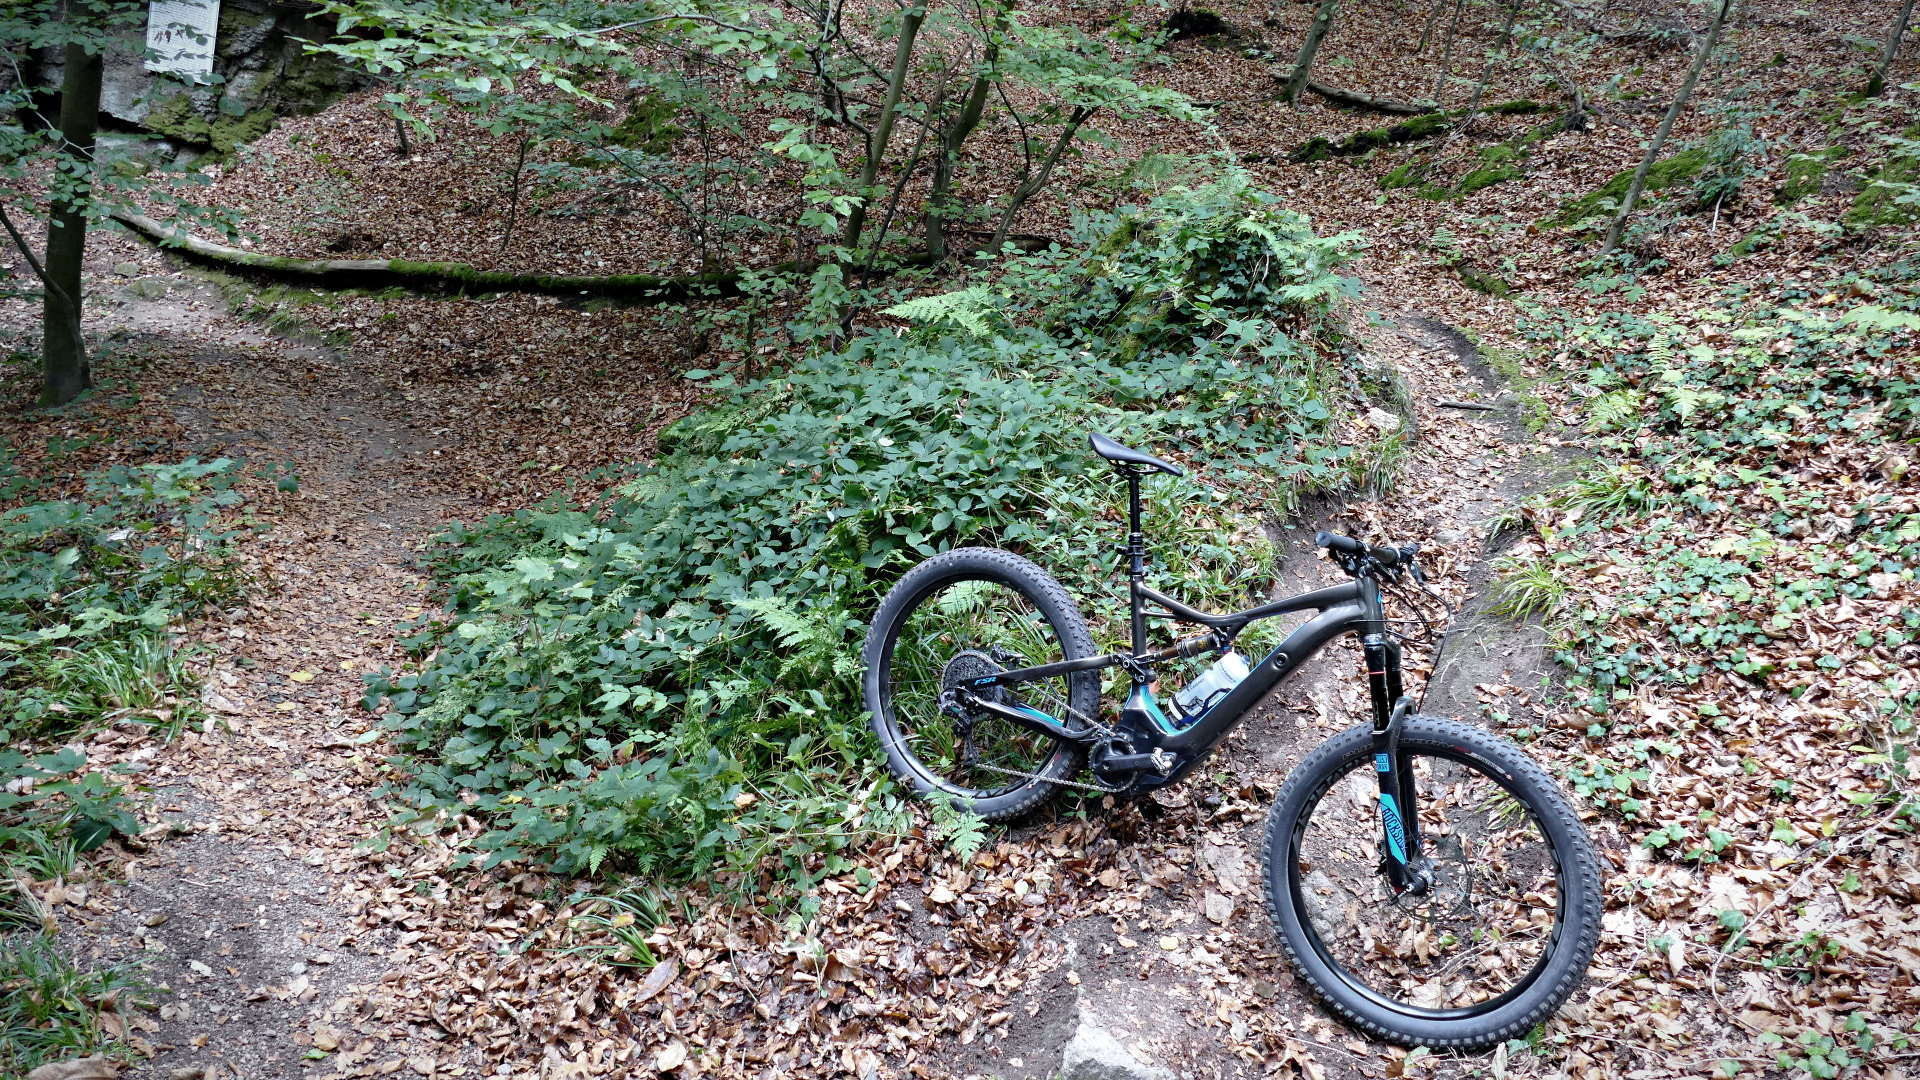 Specielized Turbo levo expert uphill Spitzkehren